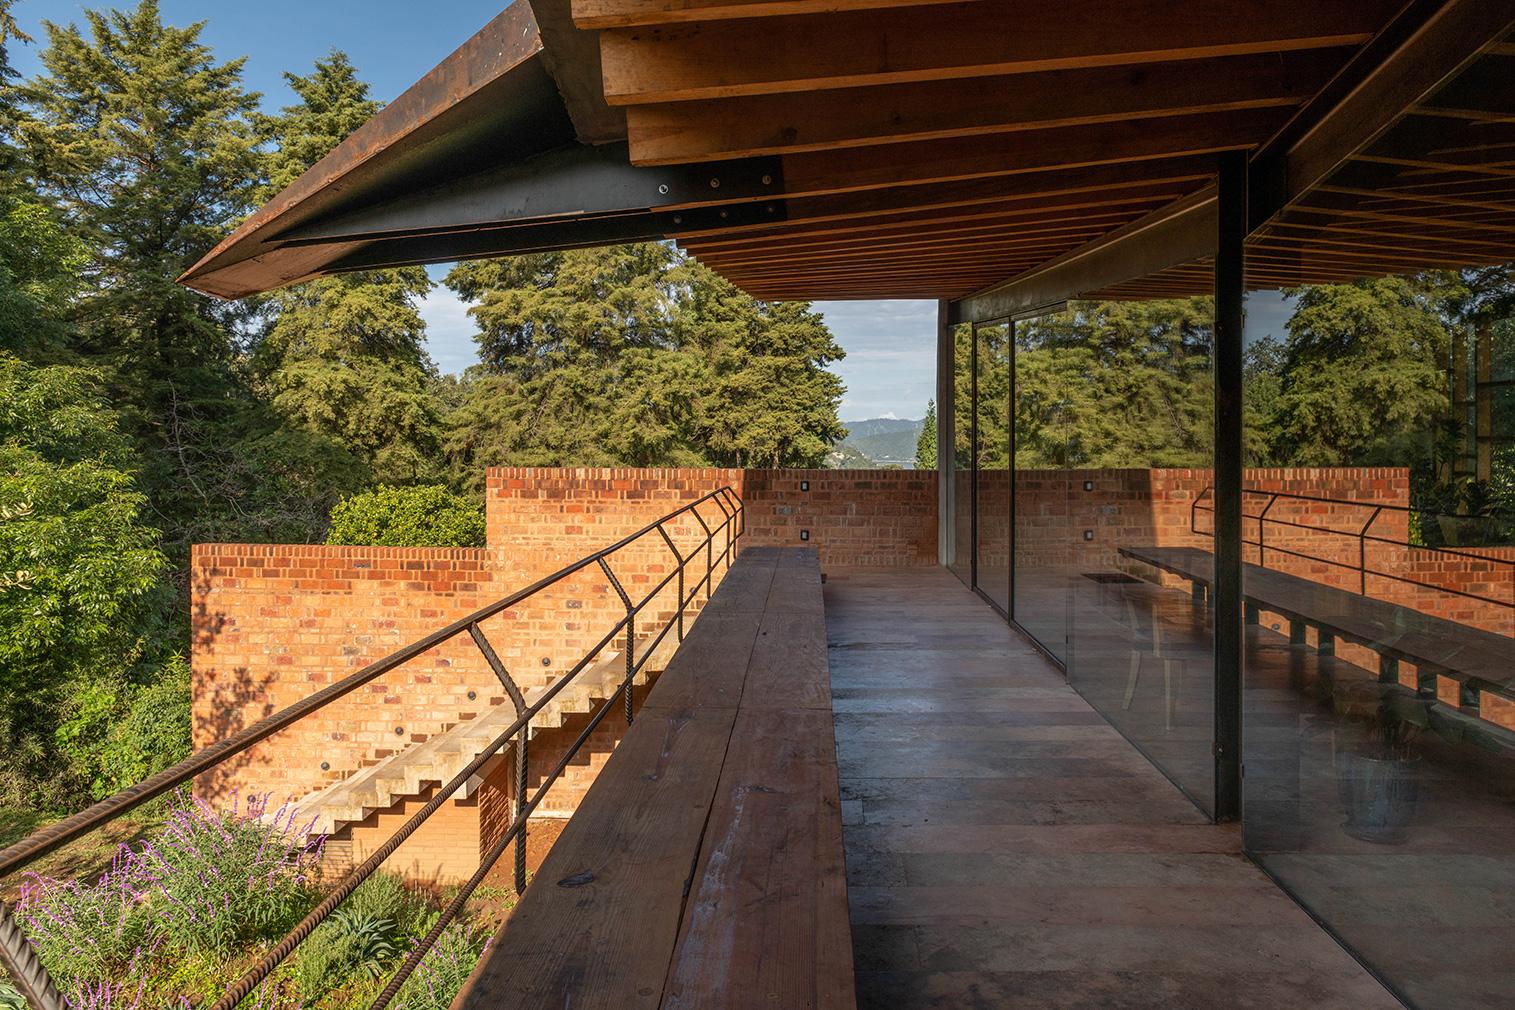 Casa Los Ailes in Mexico's Valle de Bravo - available via BoutiqueHomes